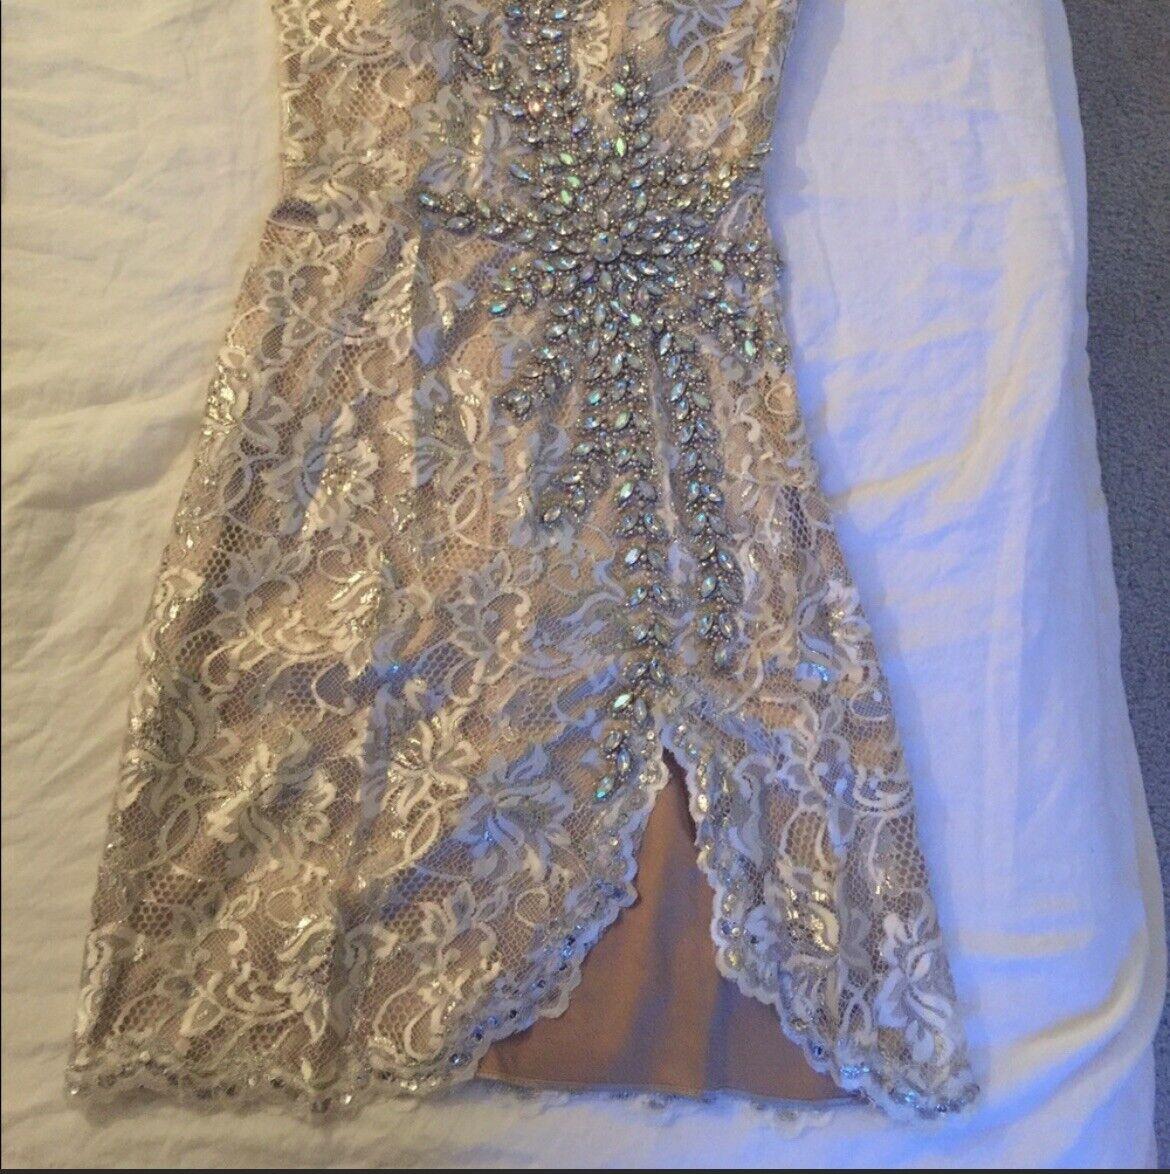 Terrani Couture Crystal Nude Dress Wedding Formal - image 4